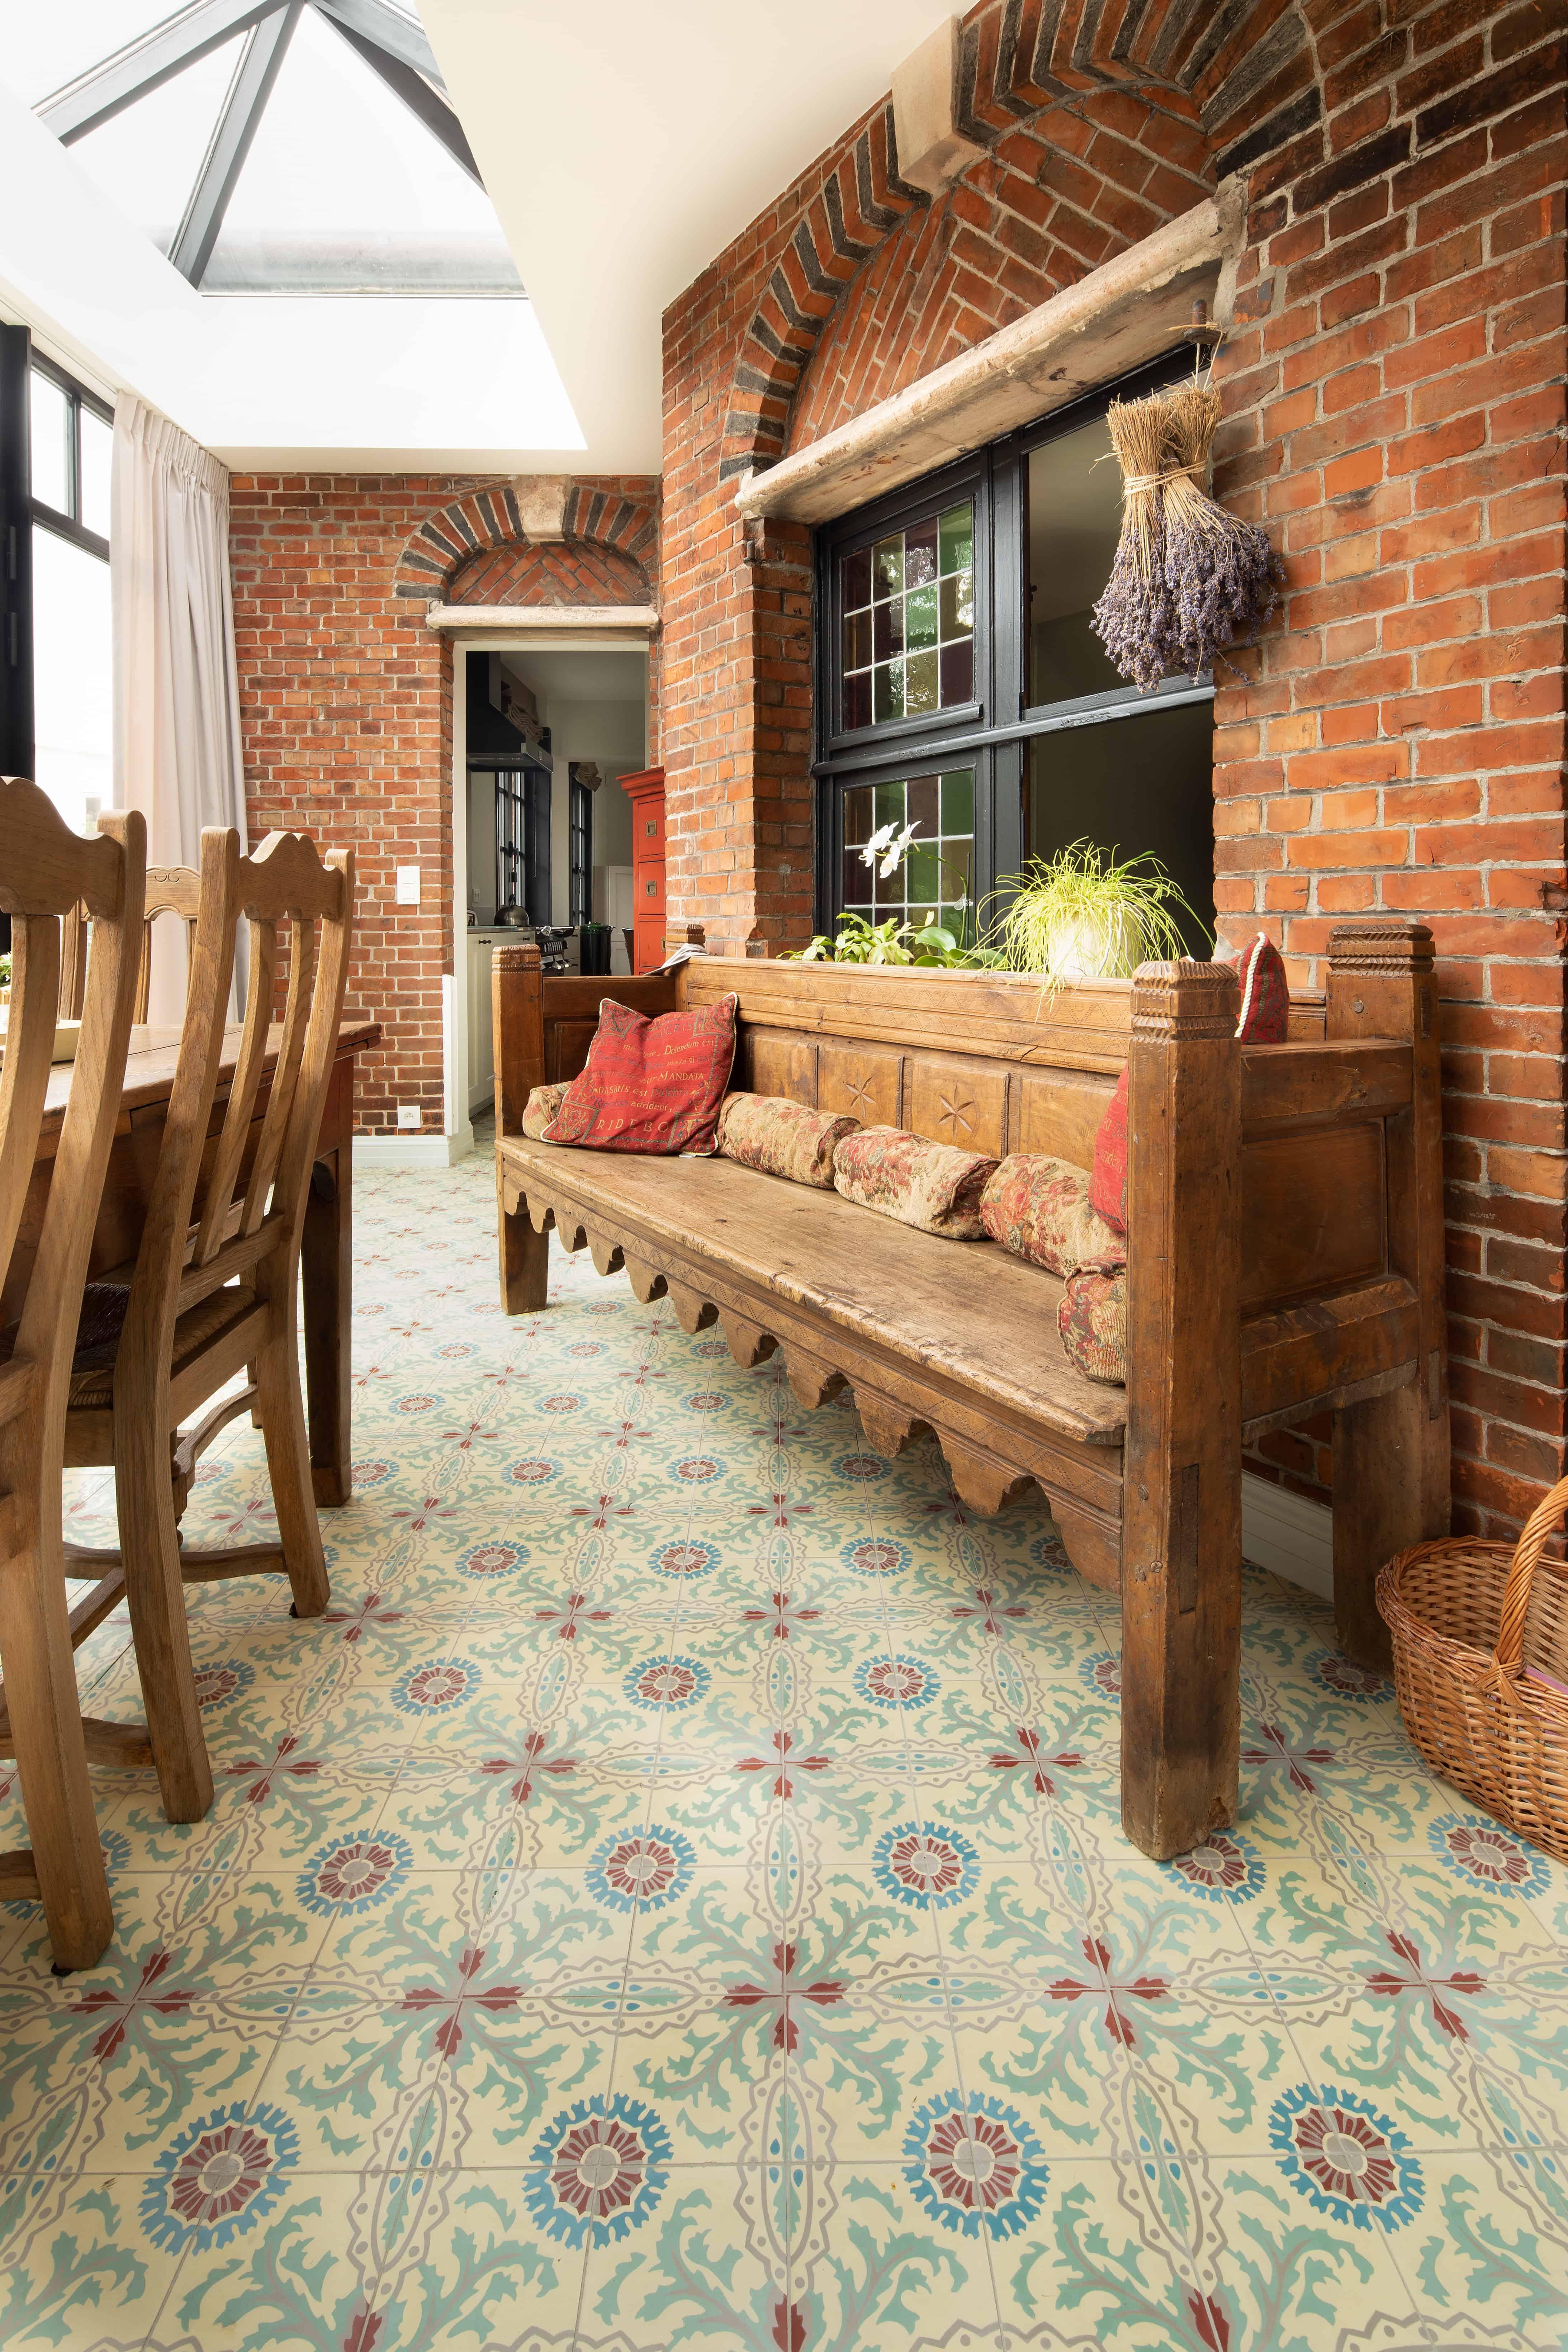 Veranda met tegels met oud motief - kleine tegels in veranda vloer